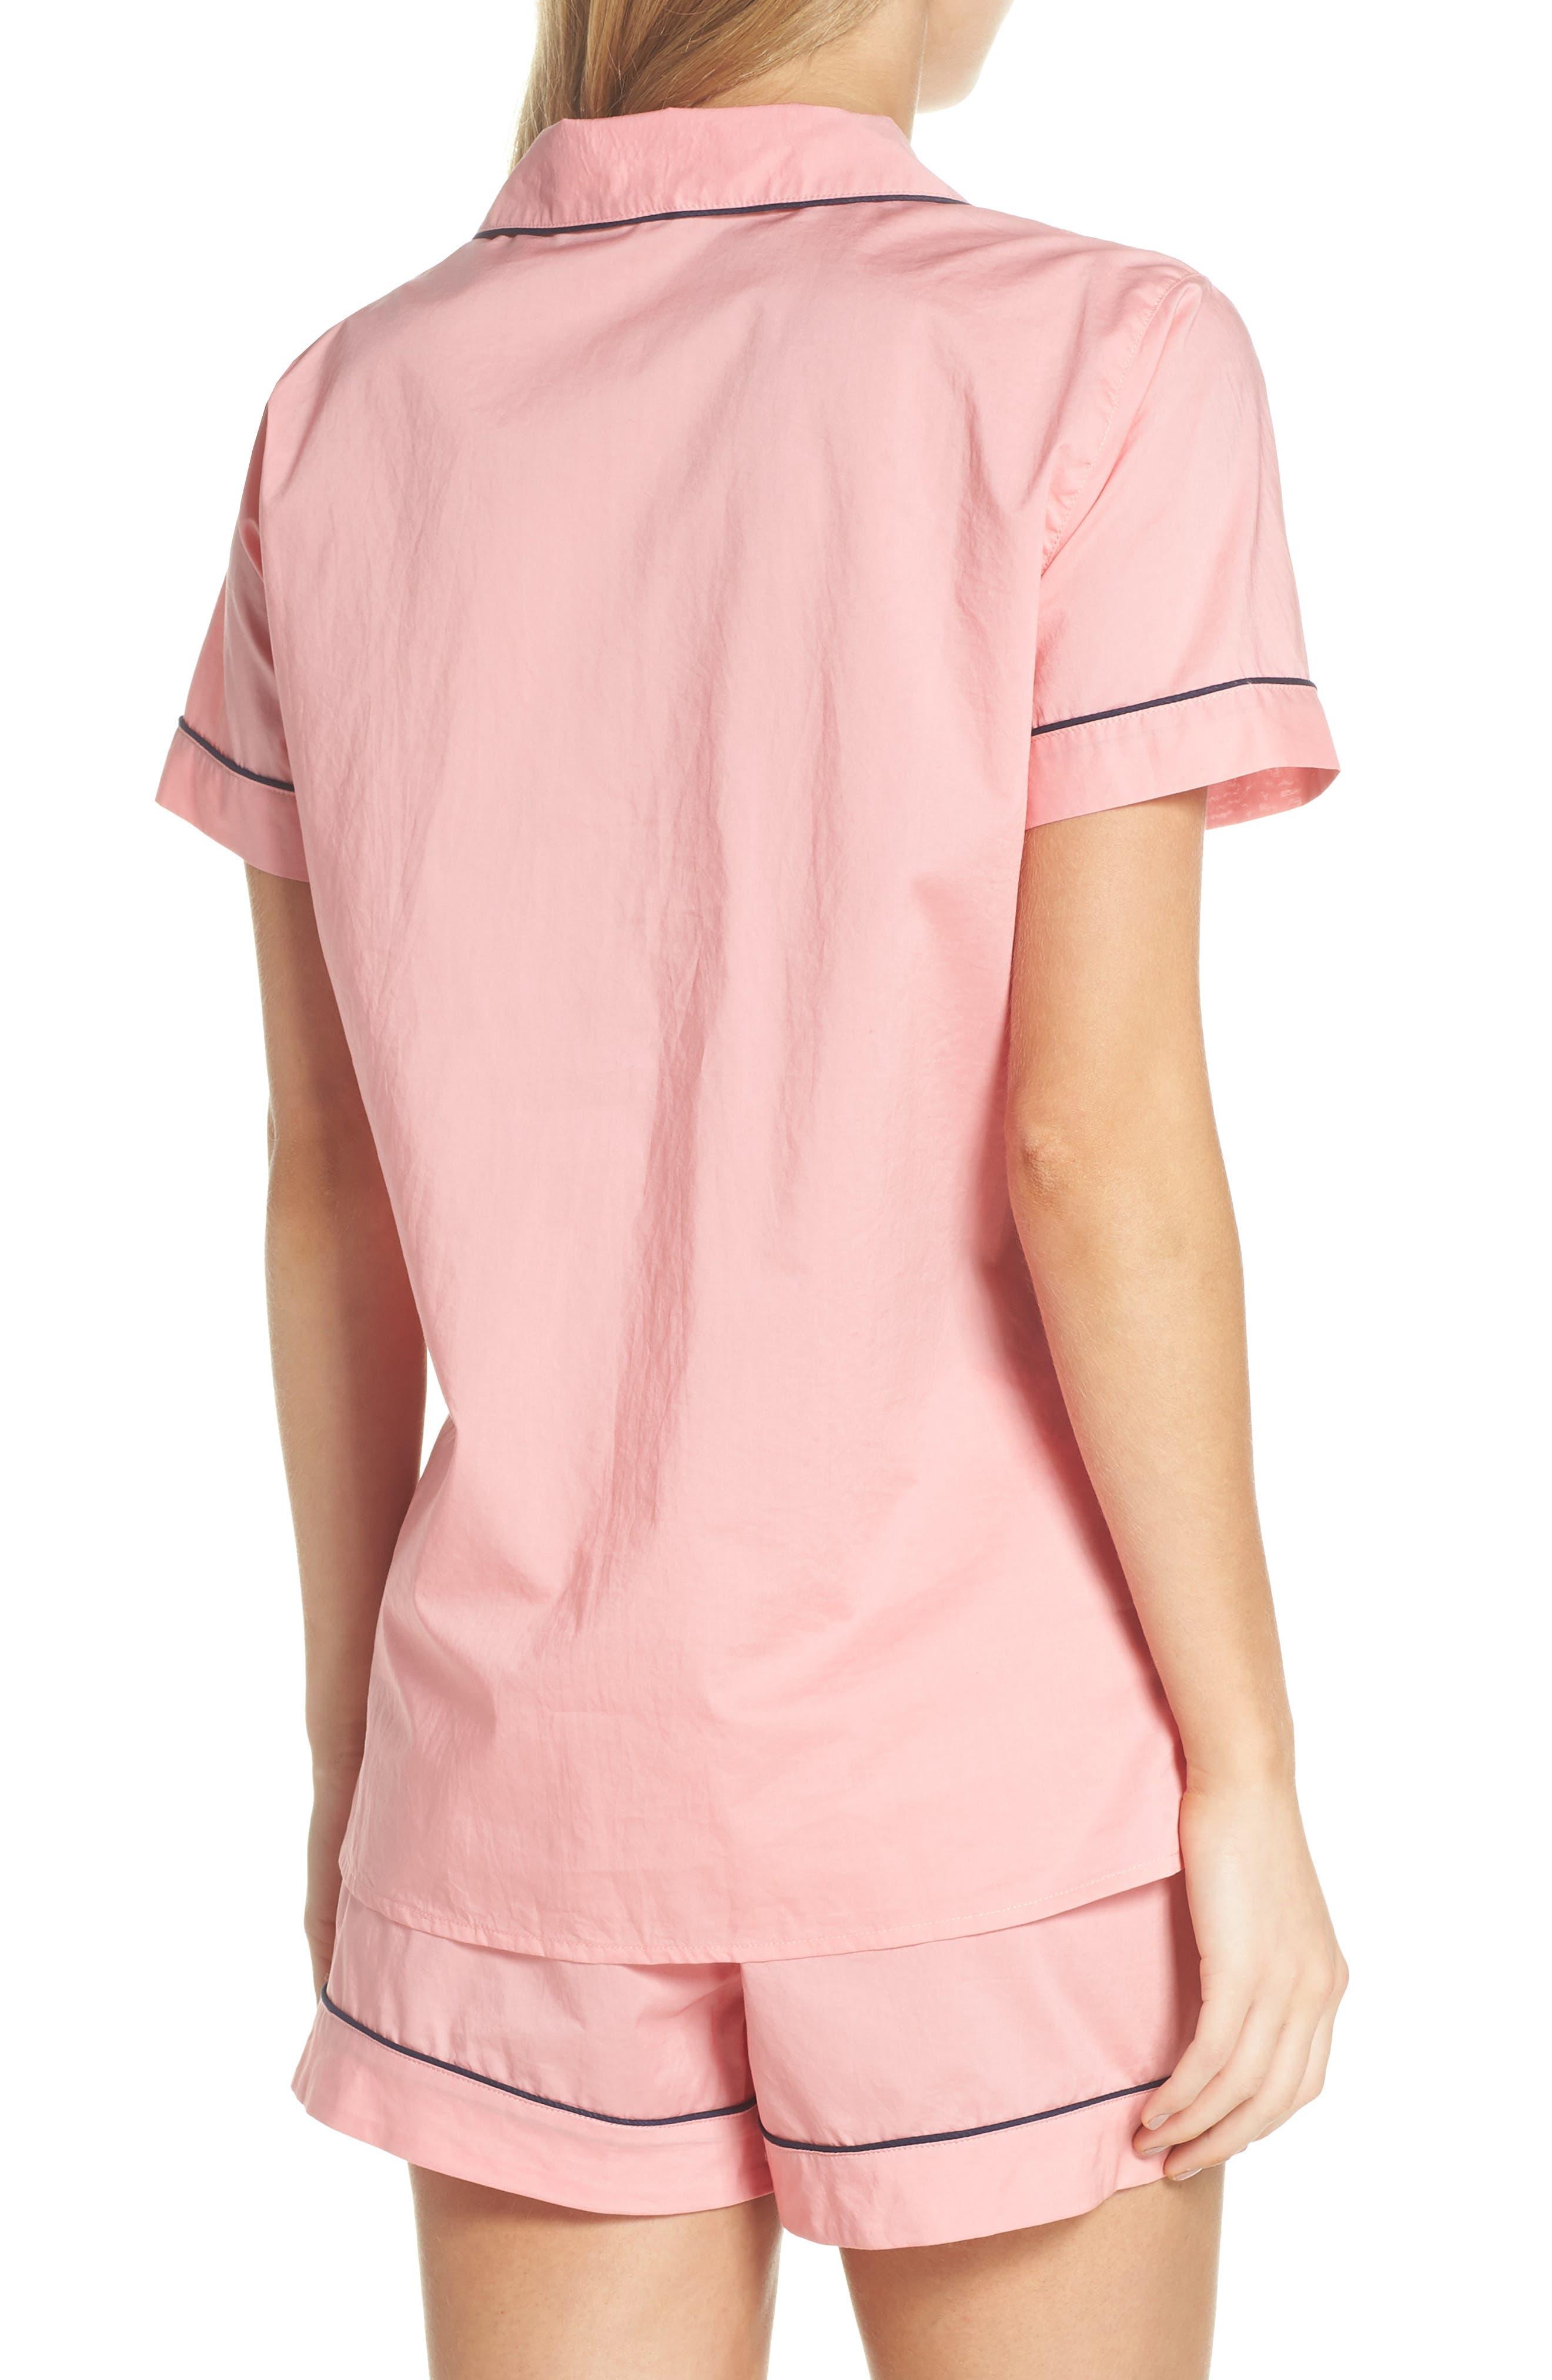 Tipped Short Pajamas,                             Alternate thumbnail 2, color,                             Cool Pink